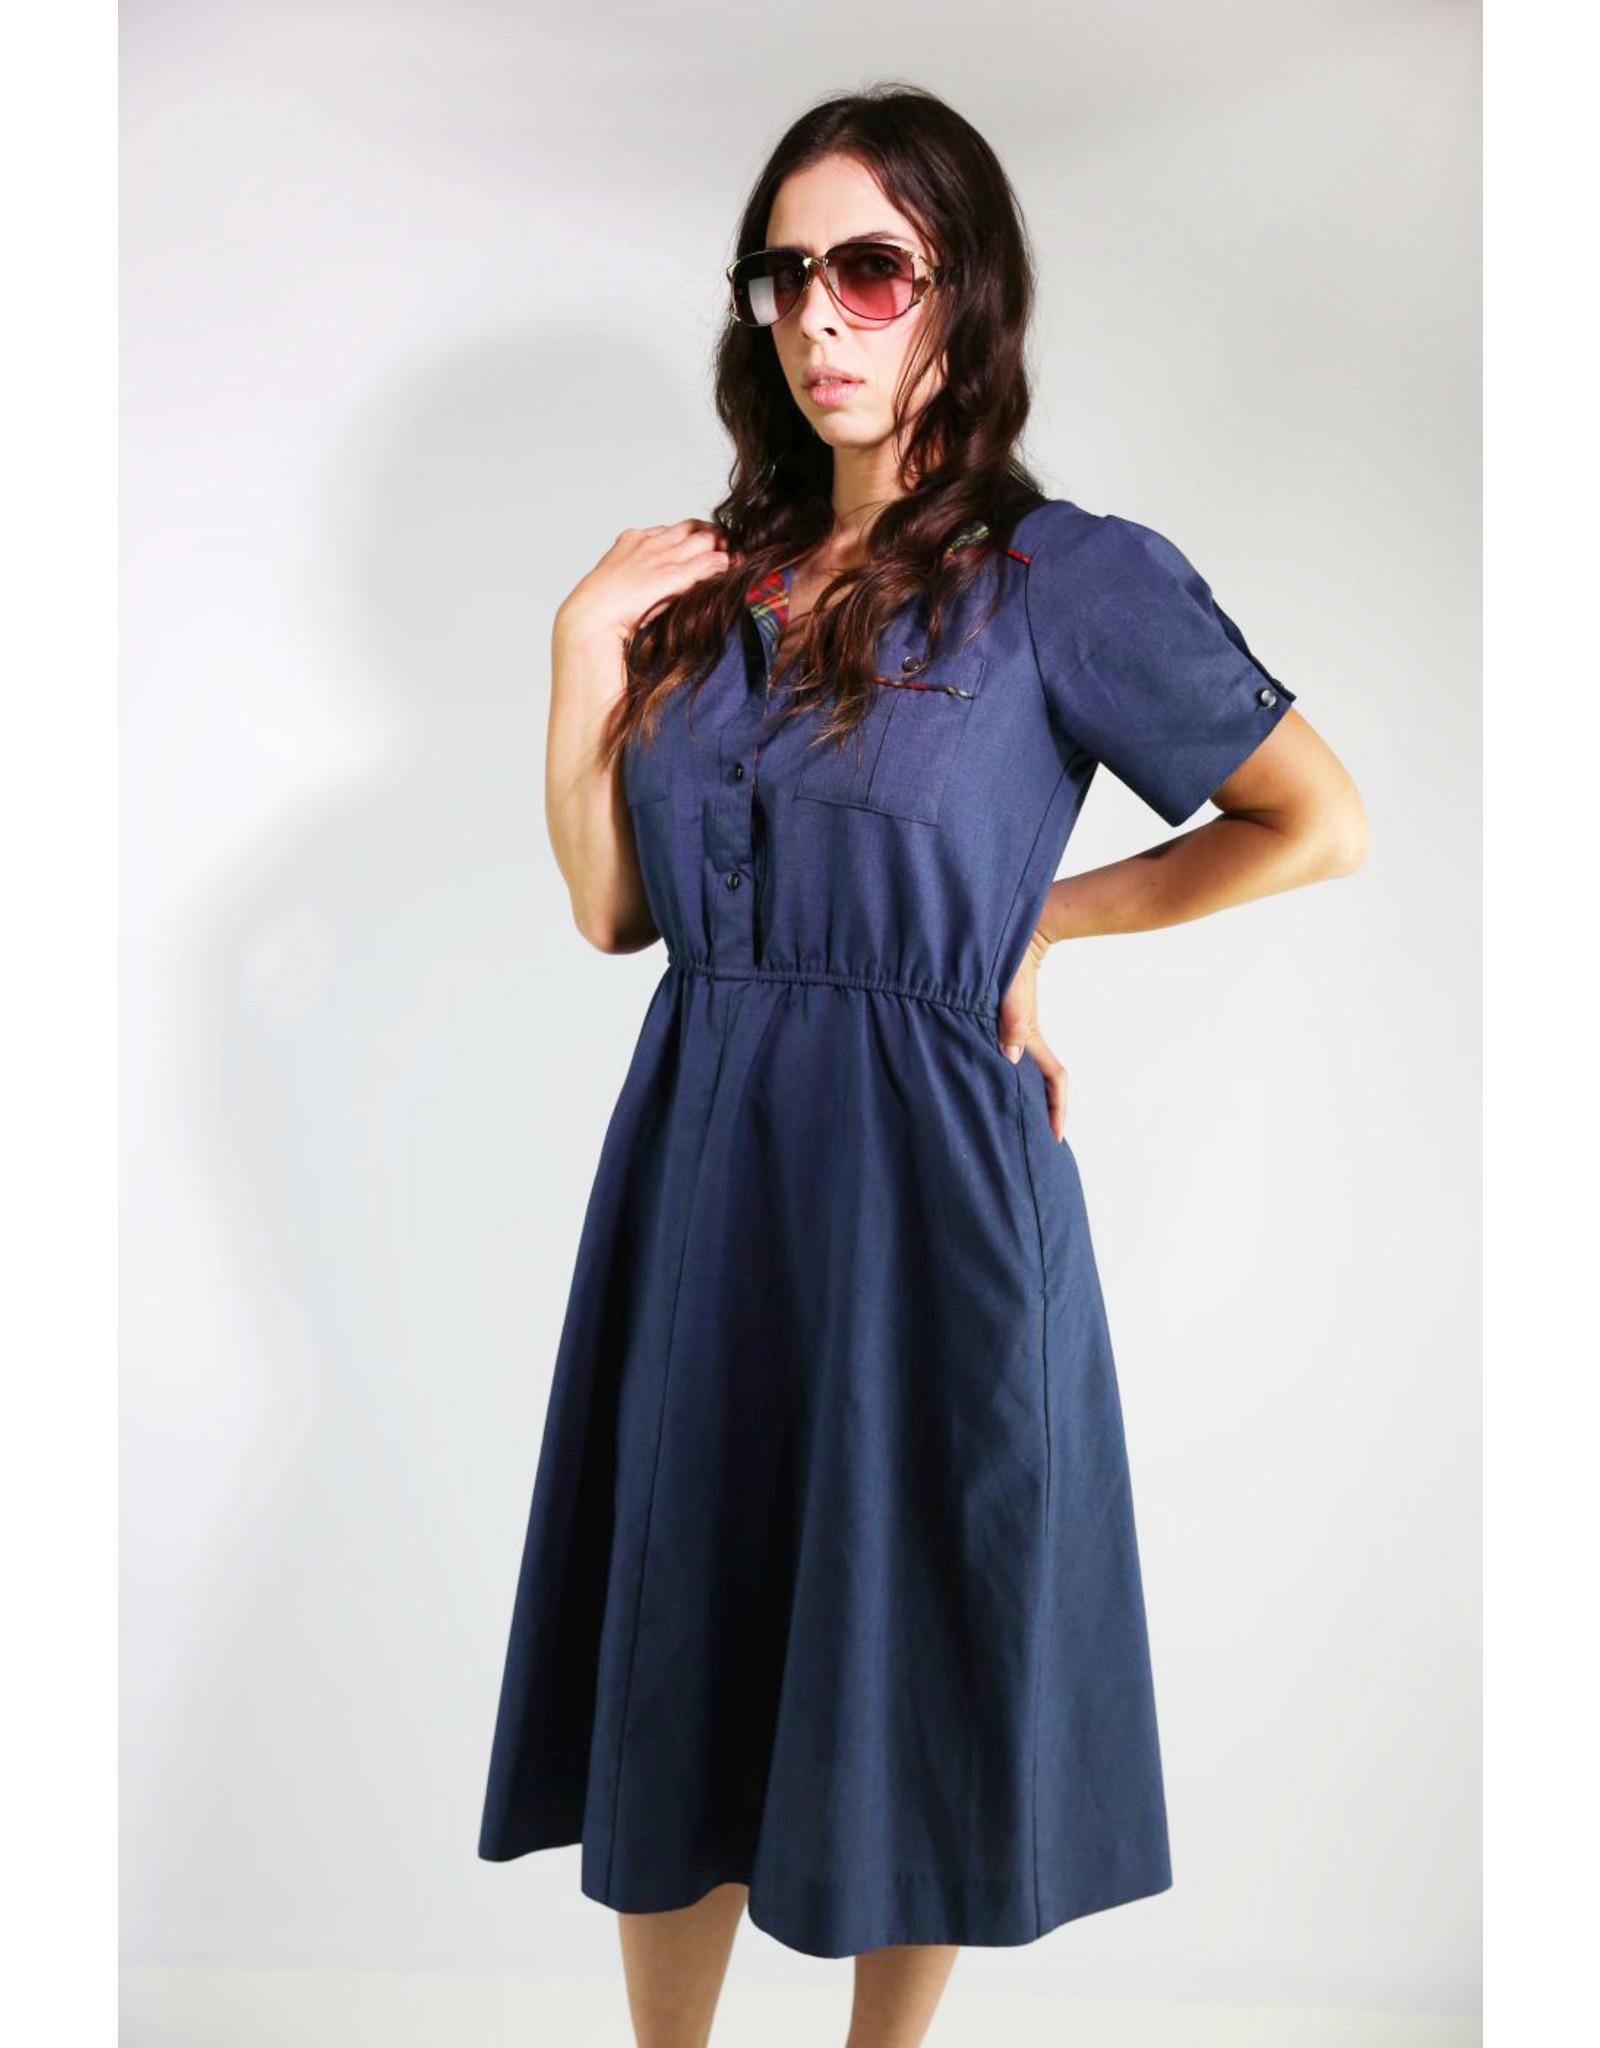 1970's Navy Utilitarian Dress